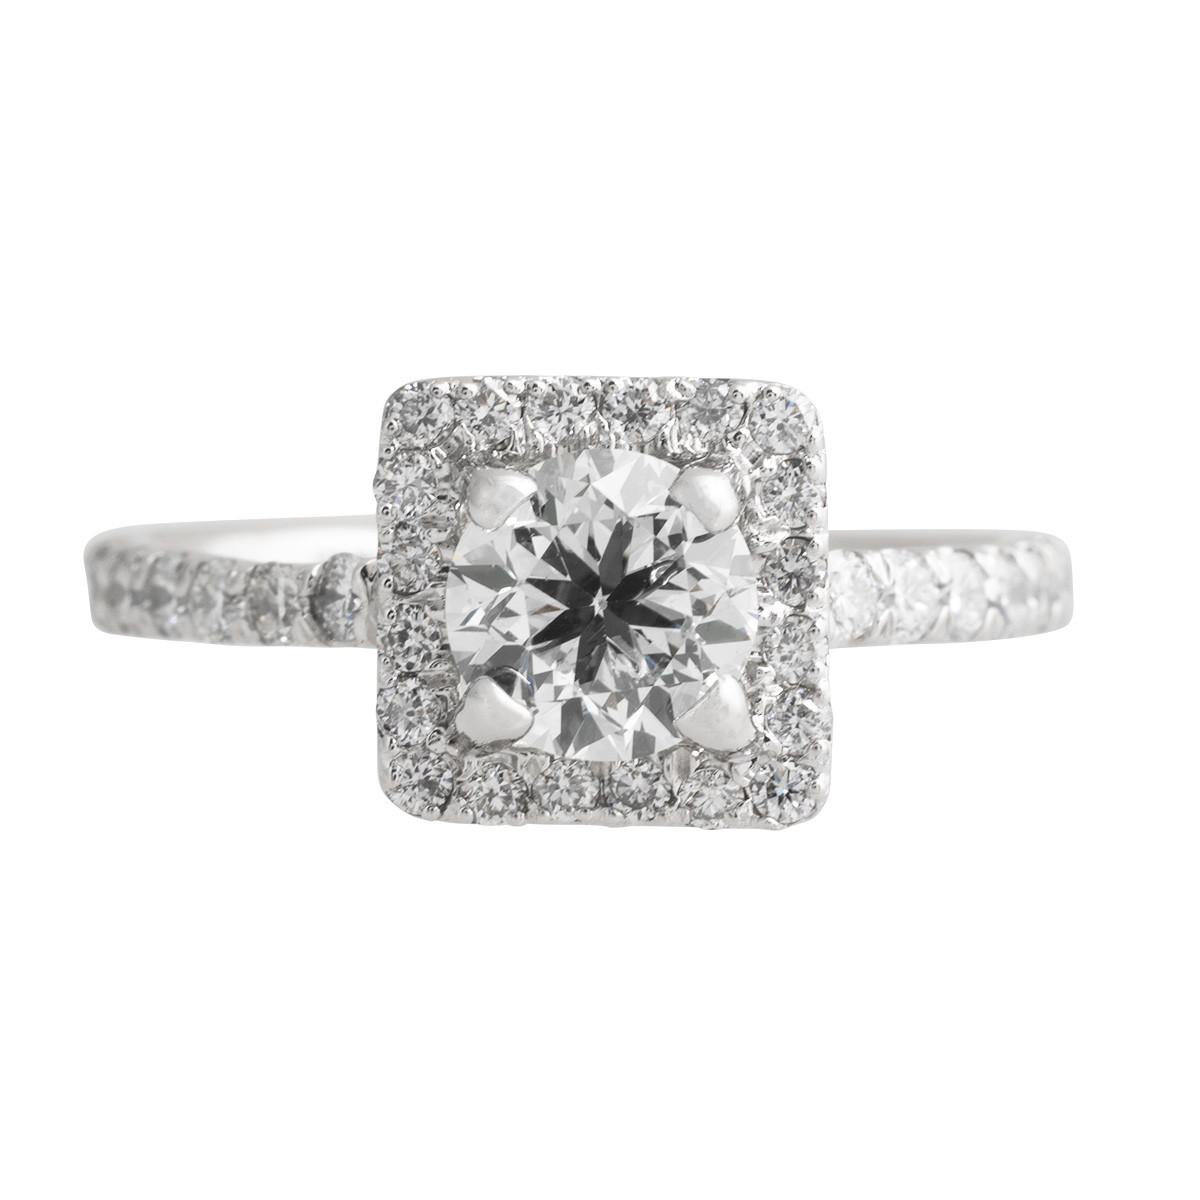 Vintage 1.62 CTW Diamond Halo Engagement Ring